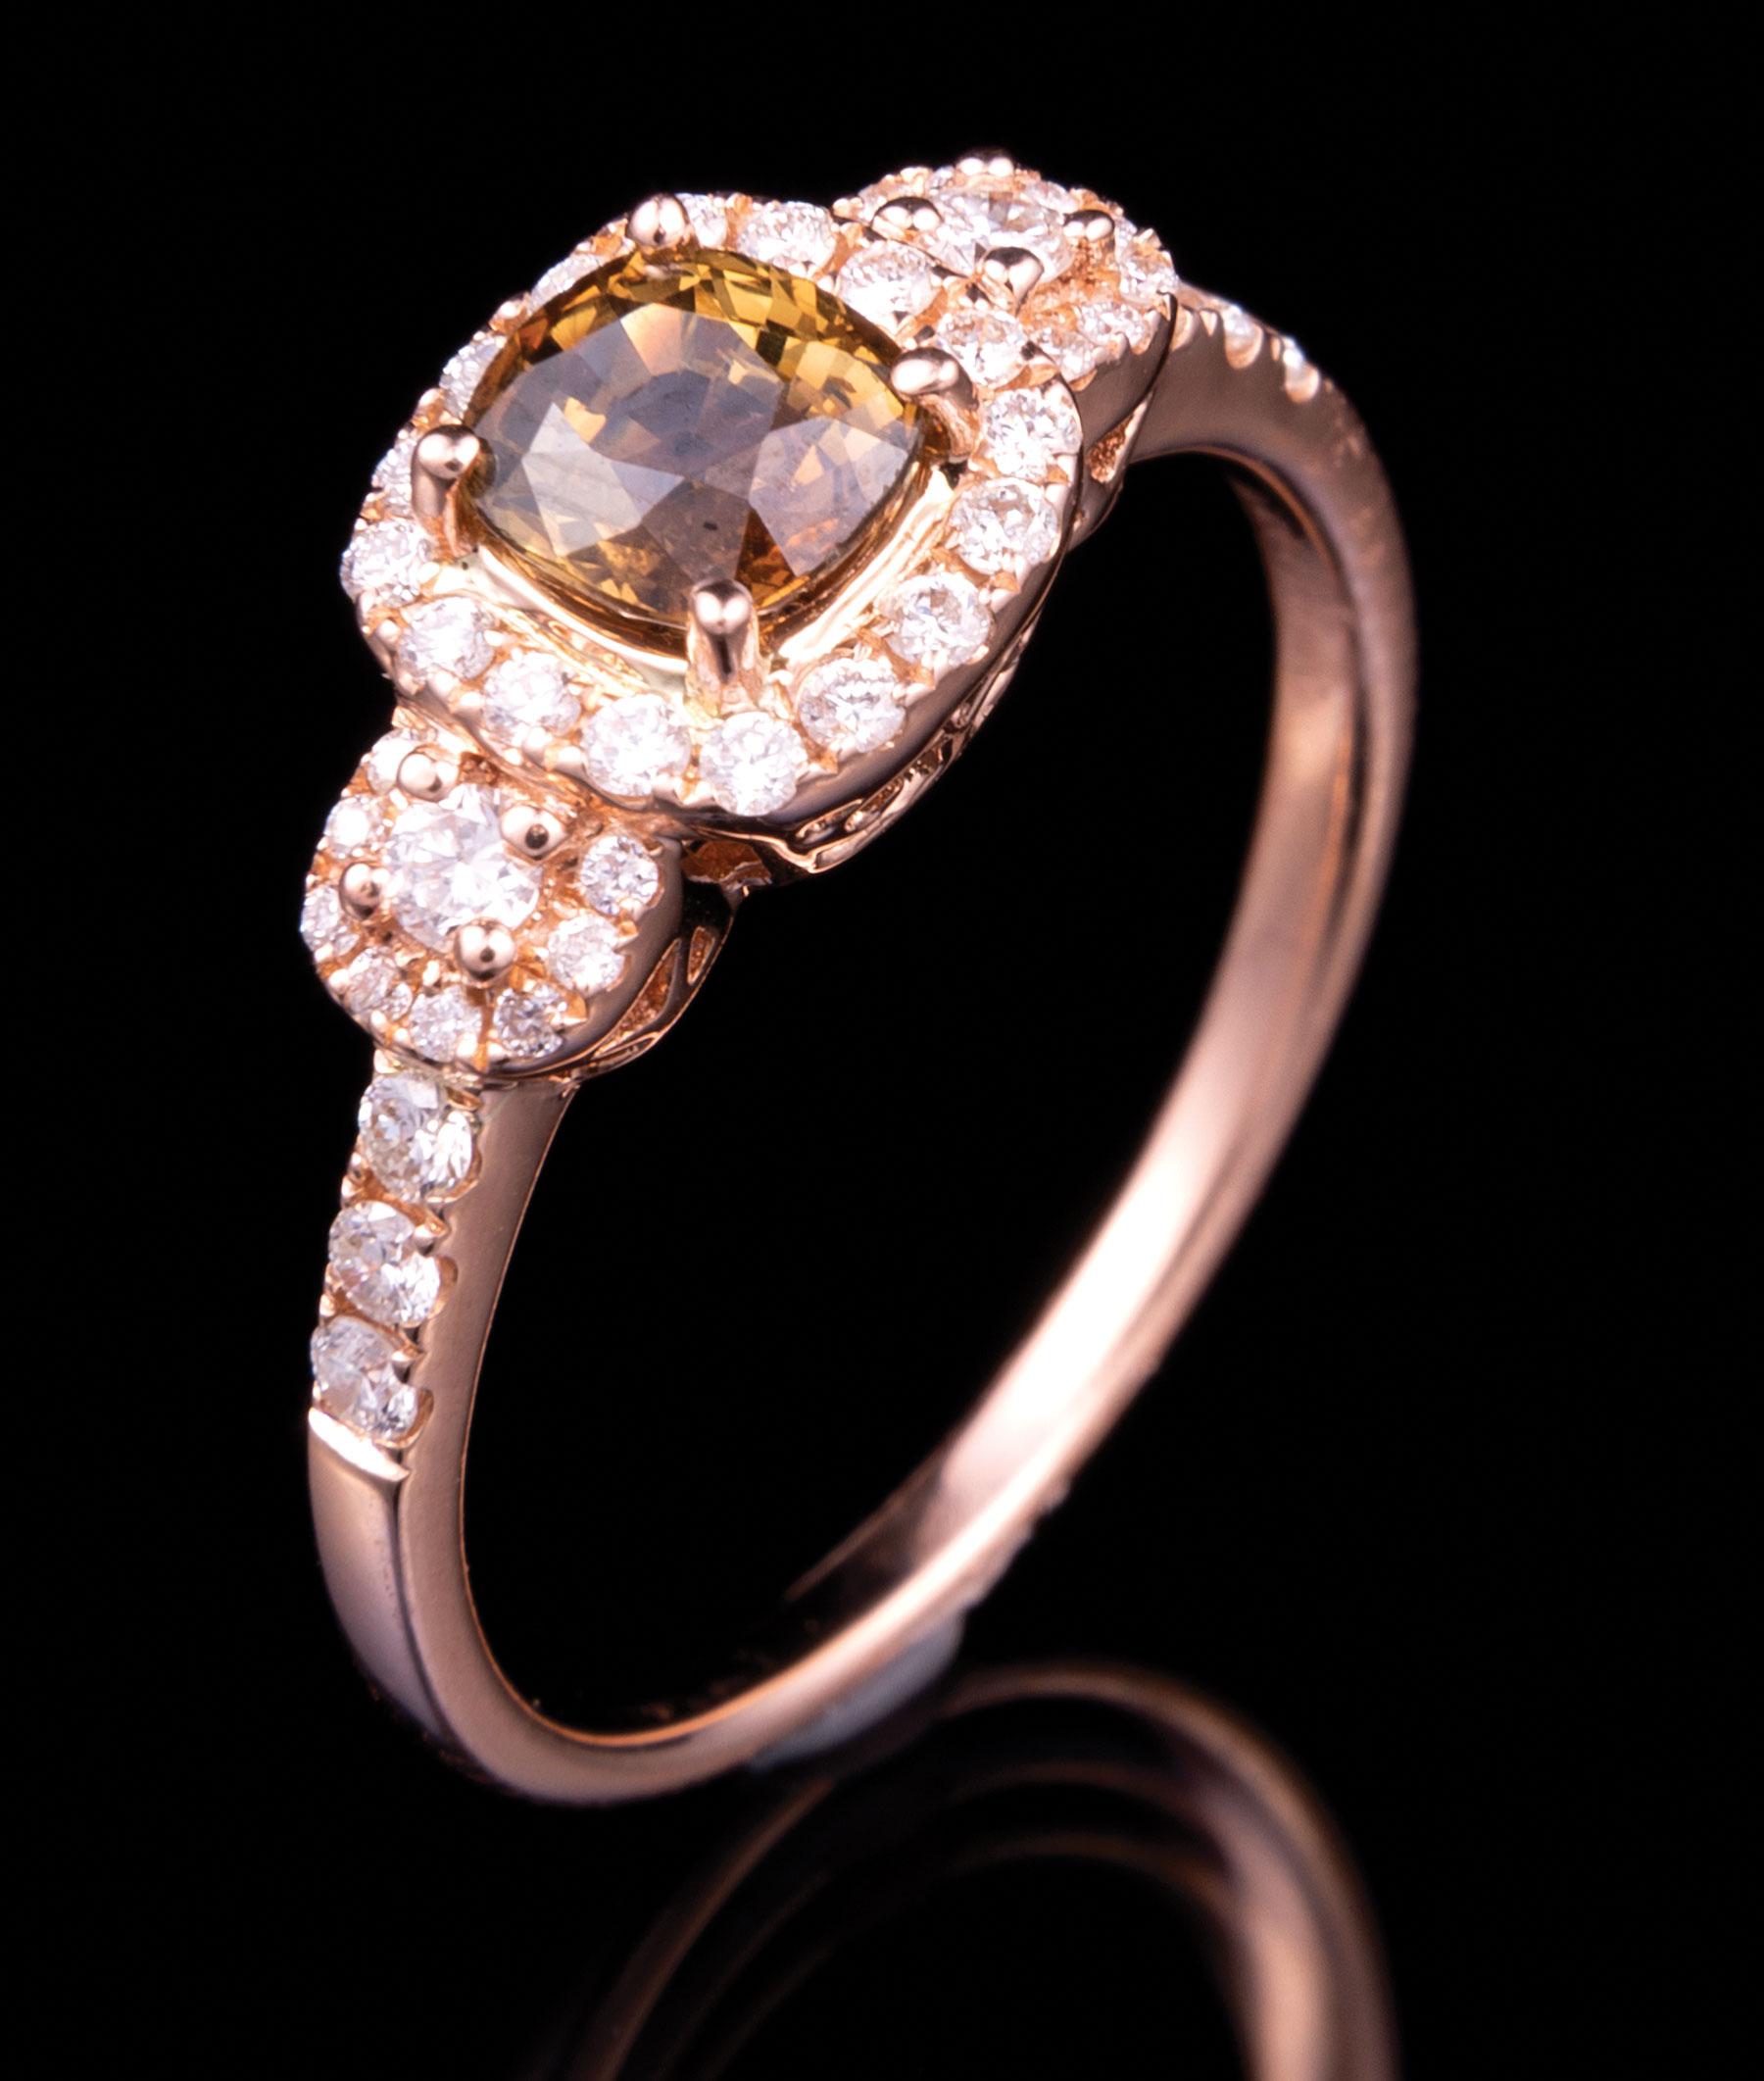 Lot 627 - 18 kt. Rose Gold, Alexandrite and Diamond Ring , prong set square cushion mixed cut natural